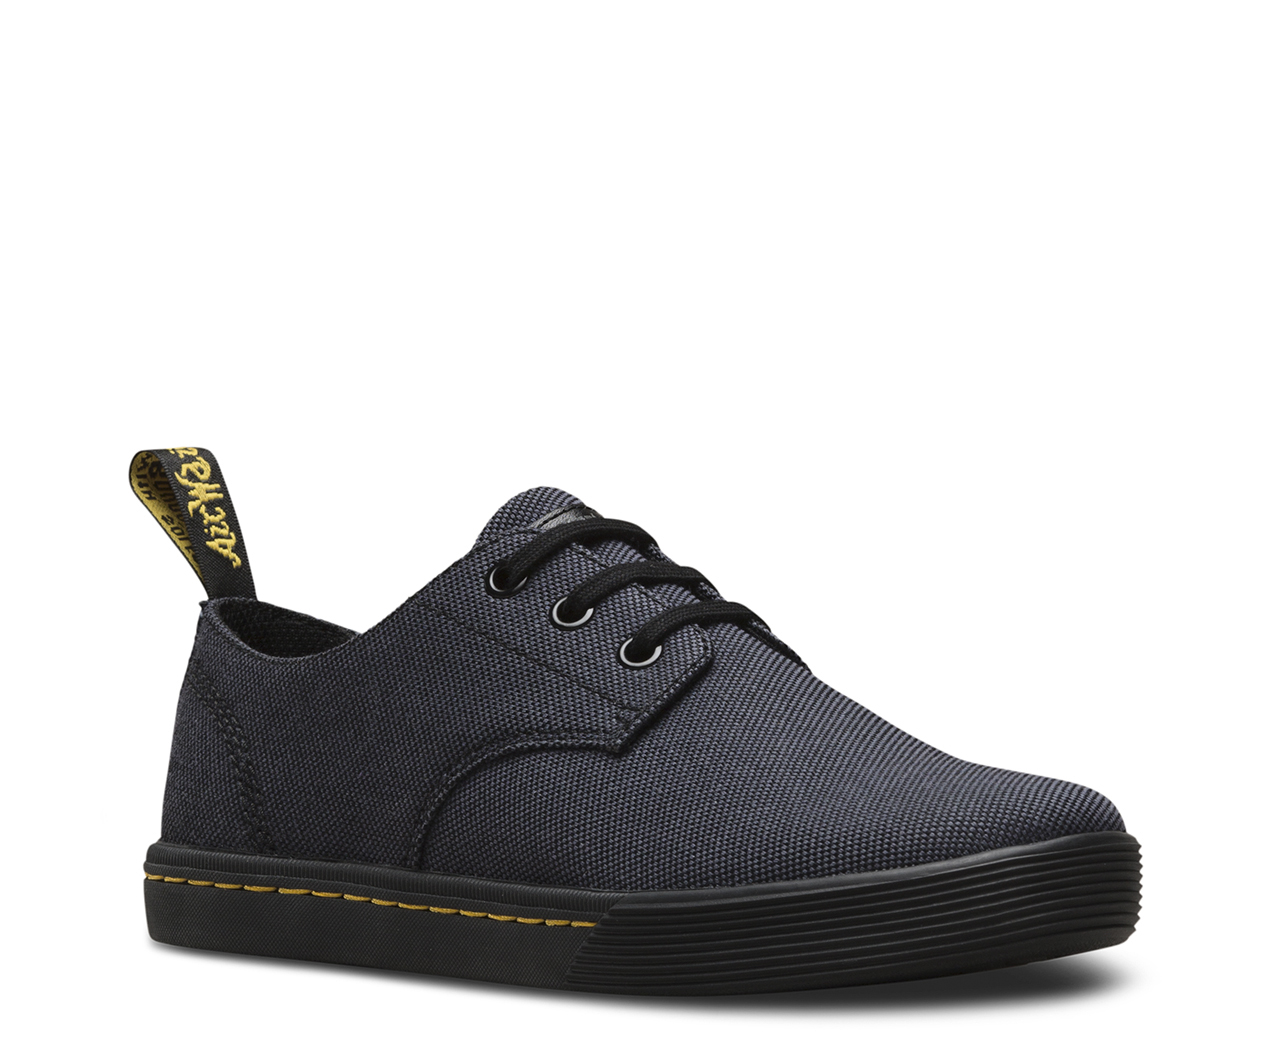 SANTANITA   Womens Shoes   The Official FR Dr Martens Store 7f3881f1a45f